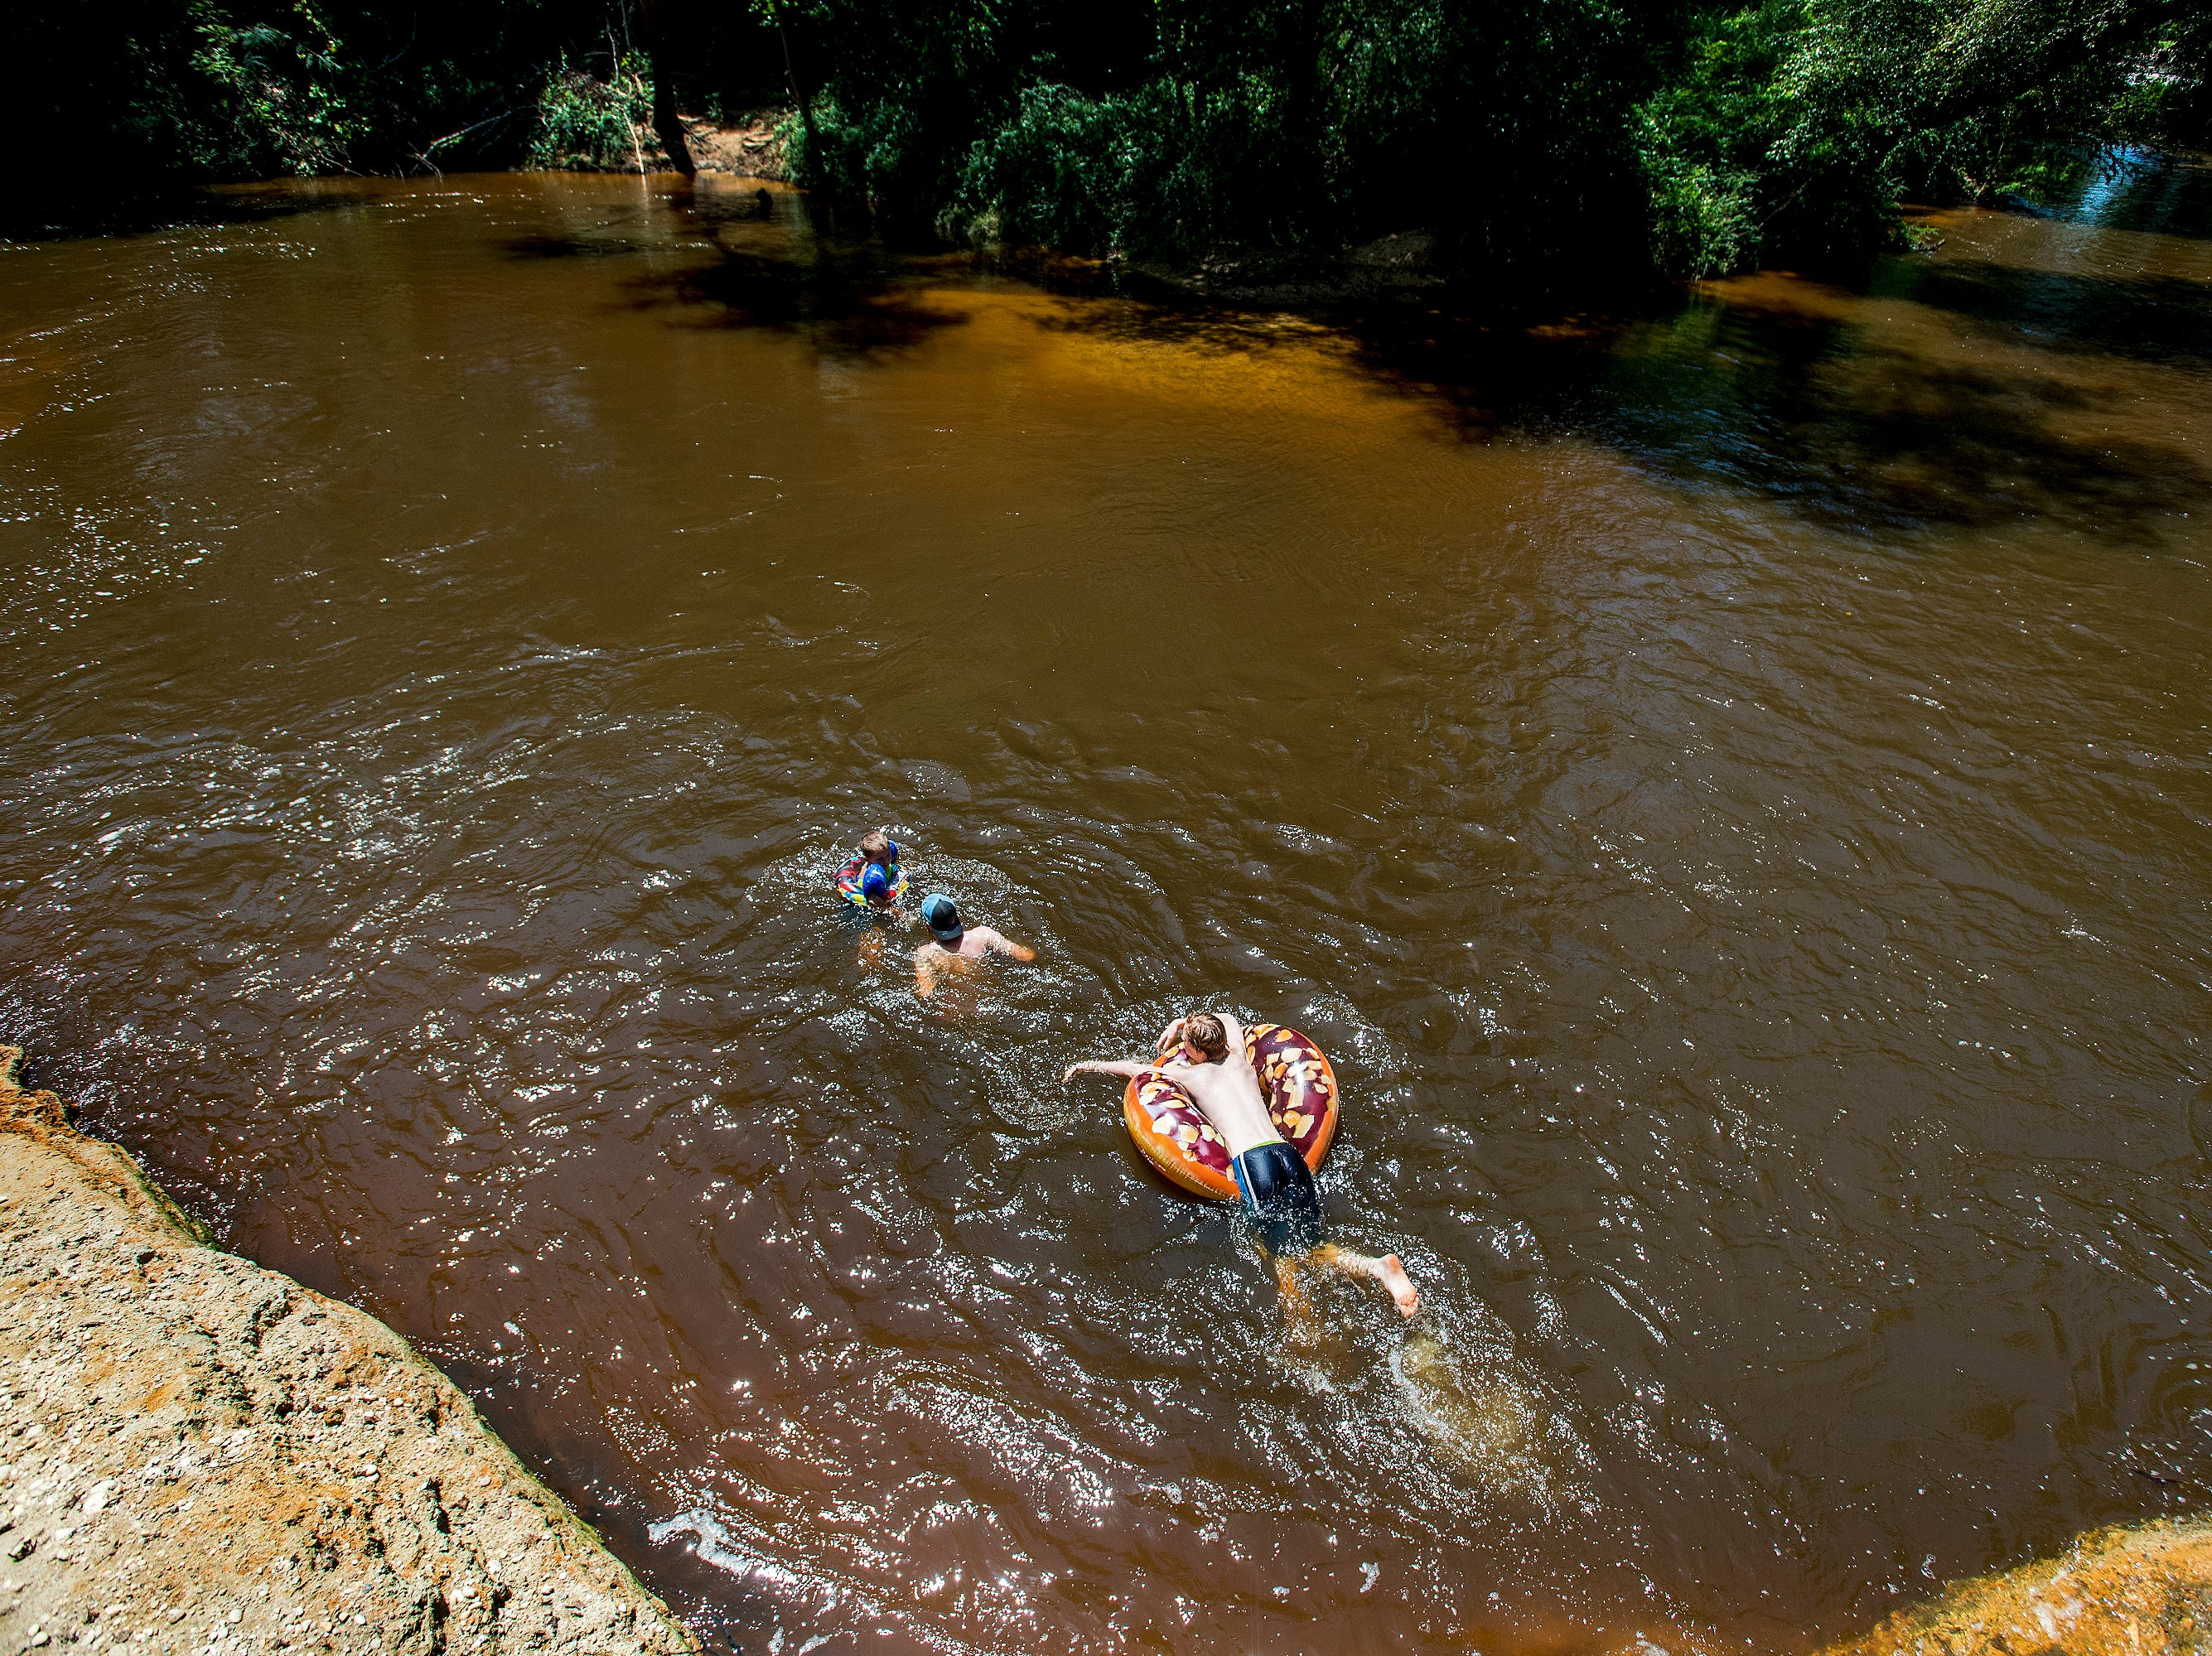 Floating on Autauga Creek in Prattville, Ala., on Saturday, July 21, 2018.